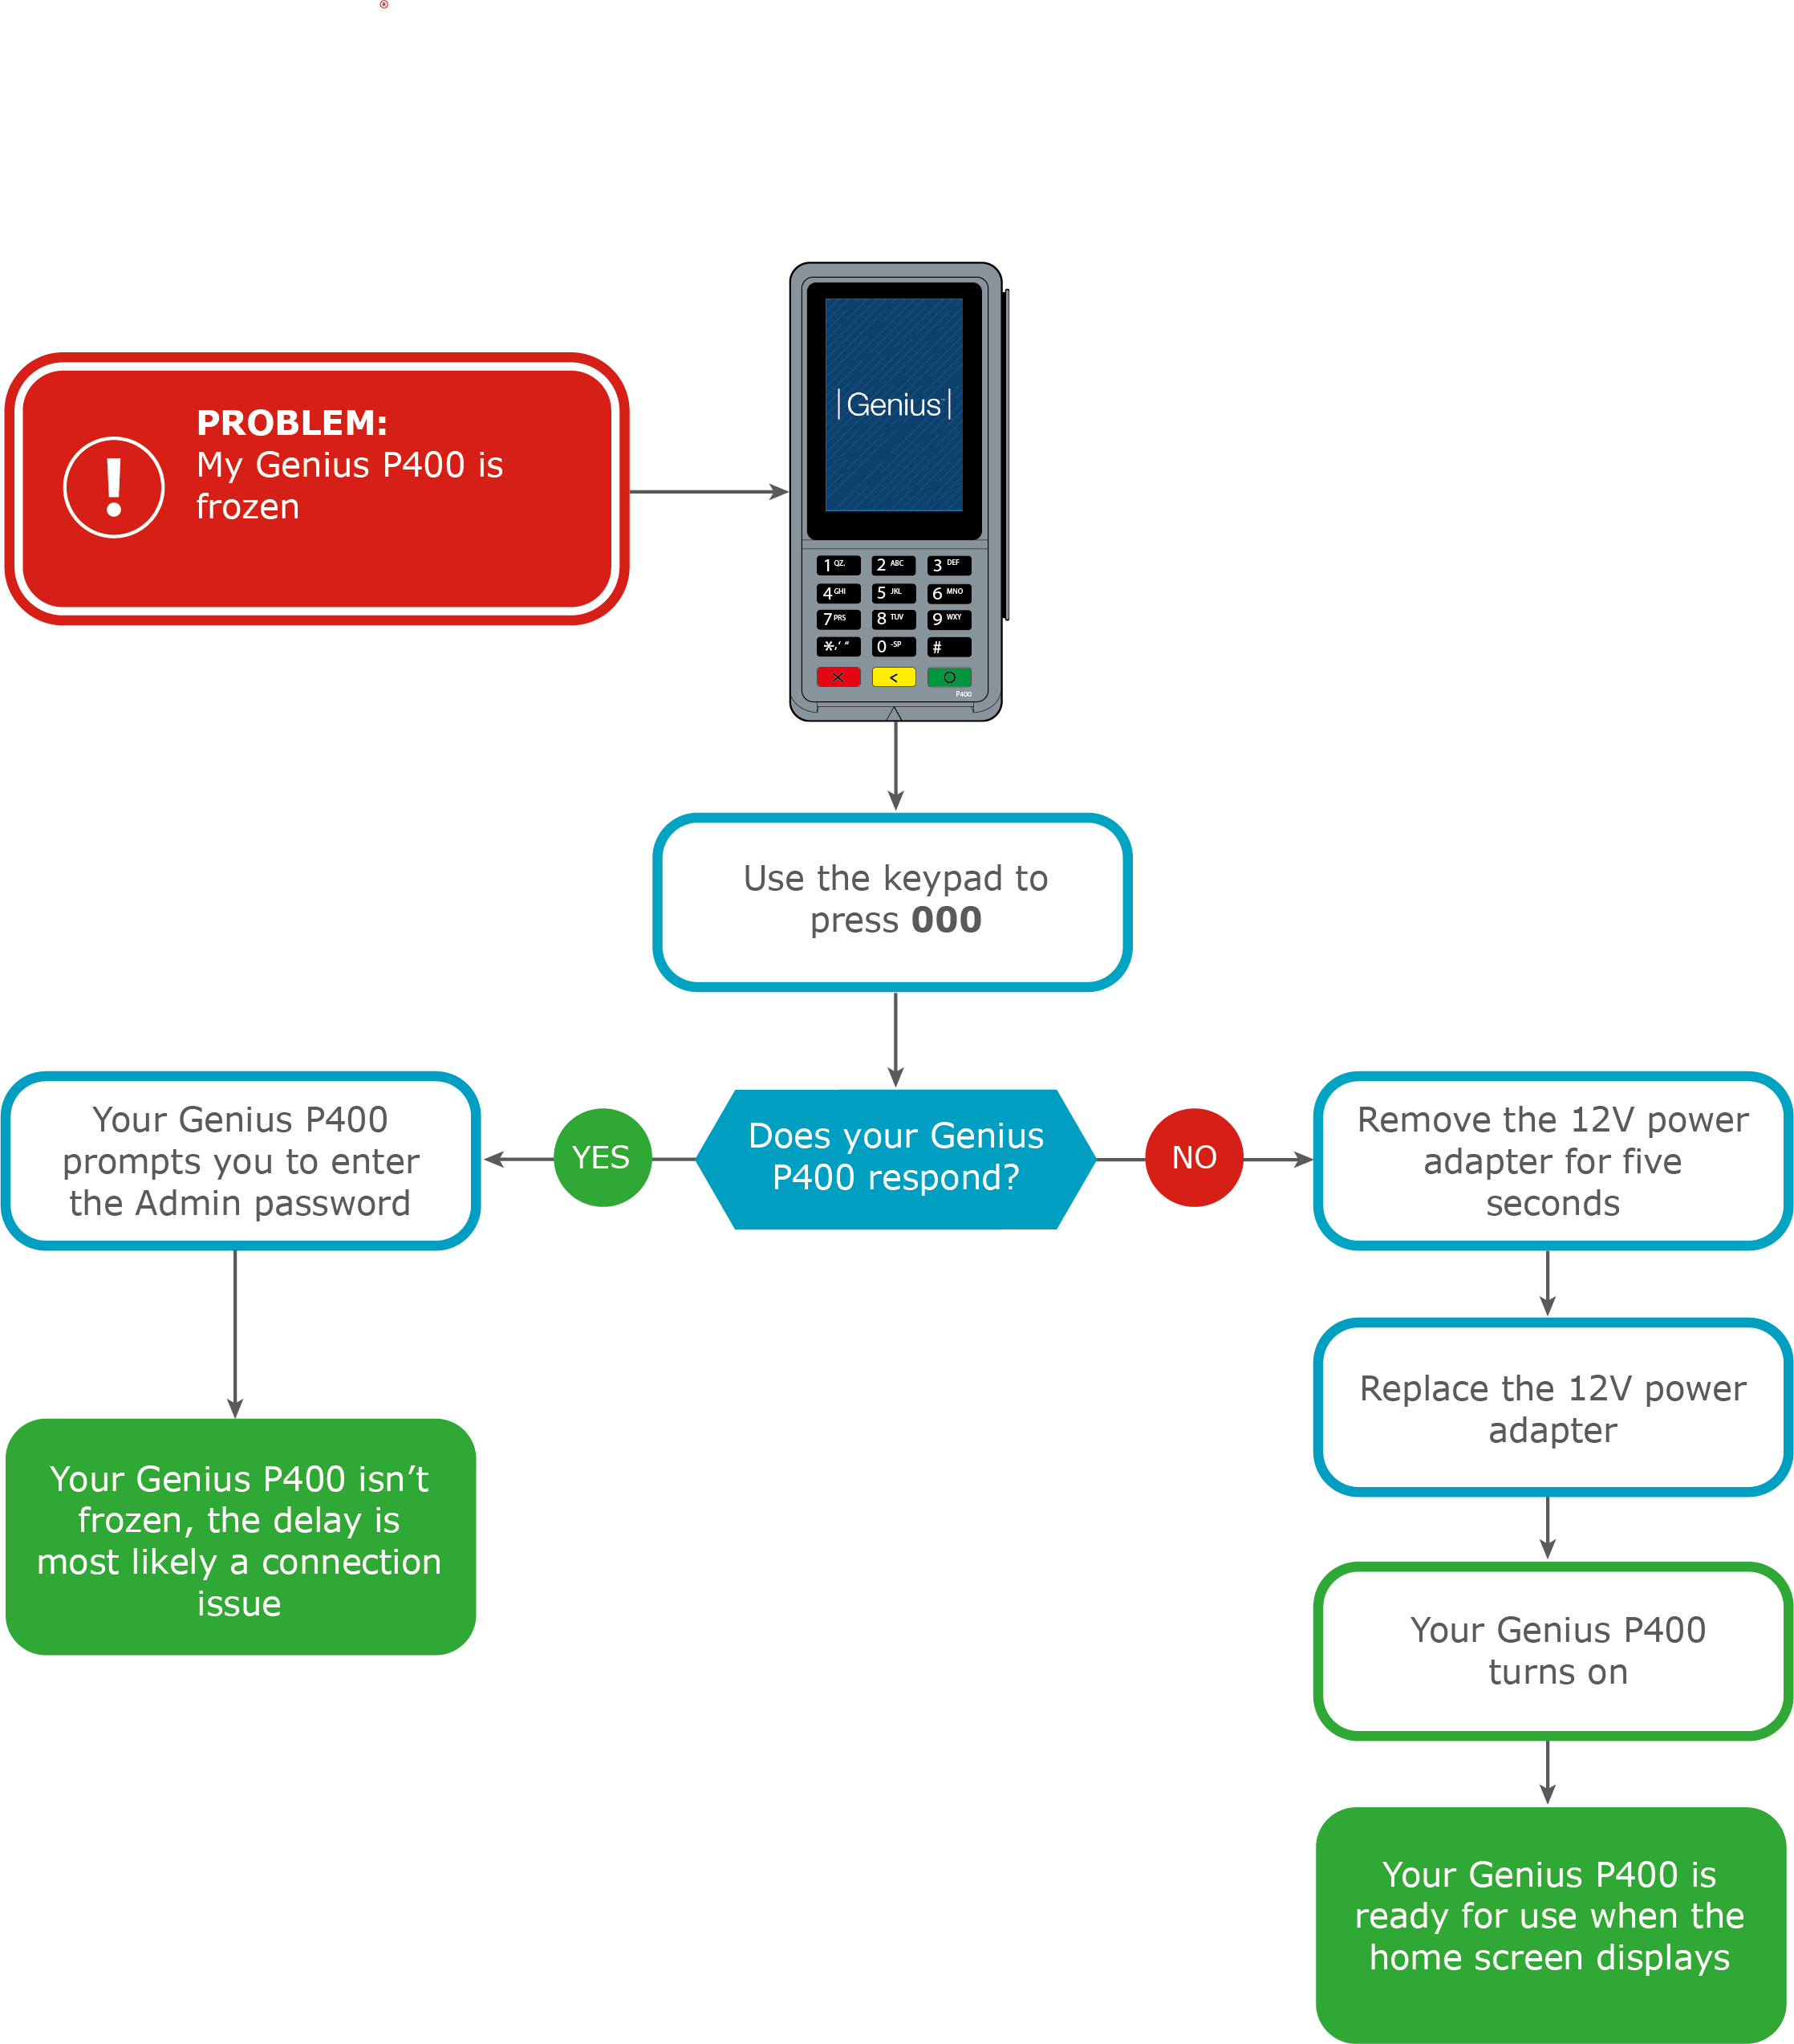 Flowchart with steps to unfreeze a Genius device.